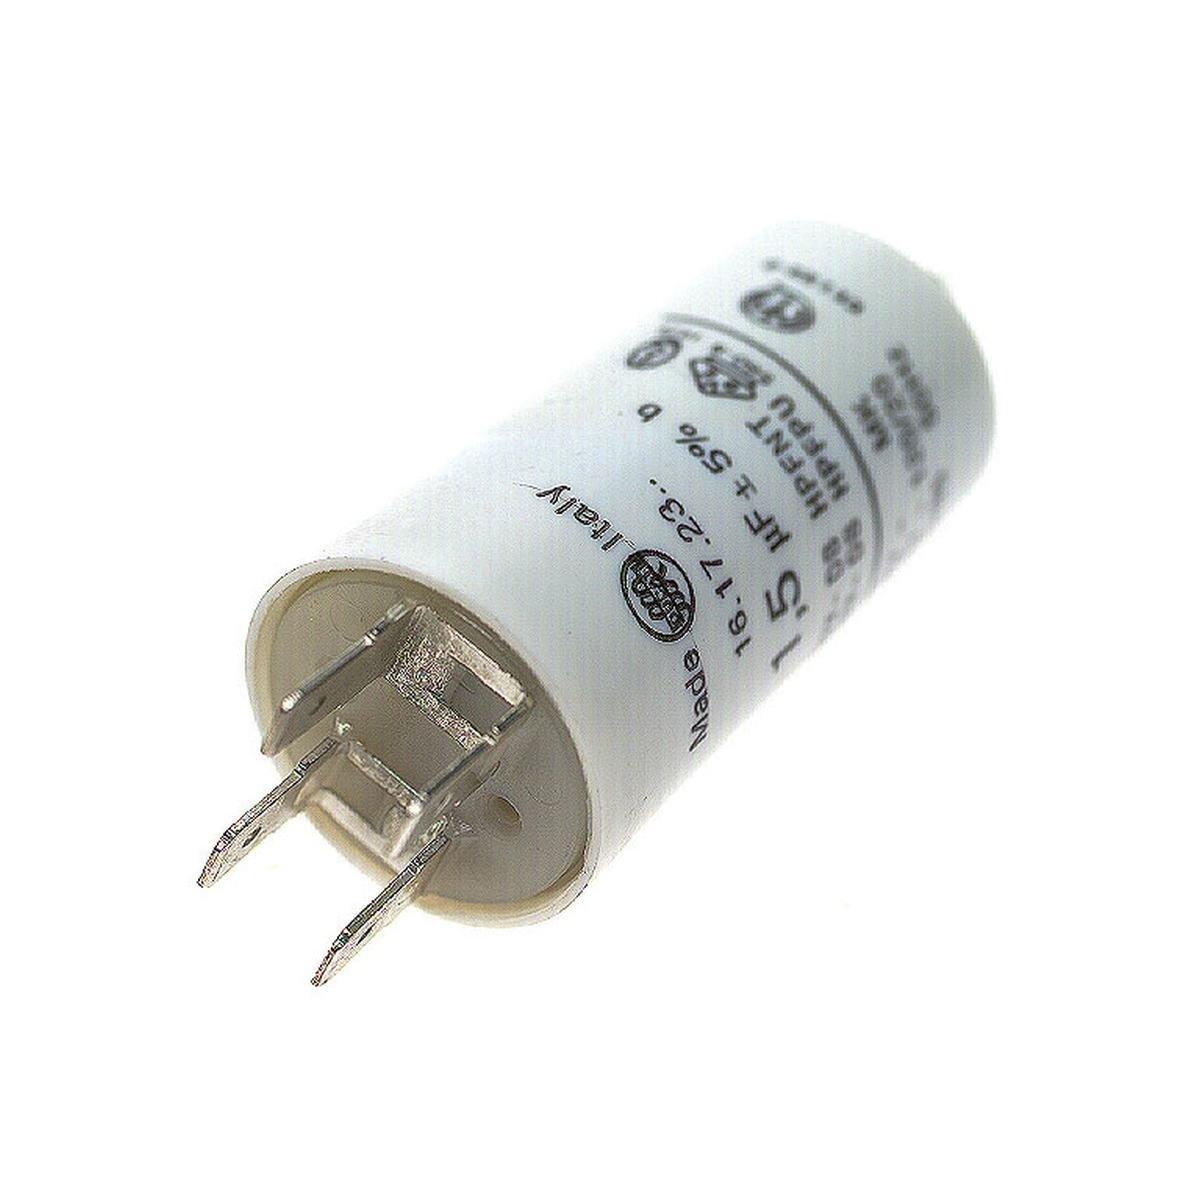 Kondensator 3,5 µF 450V